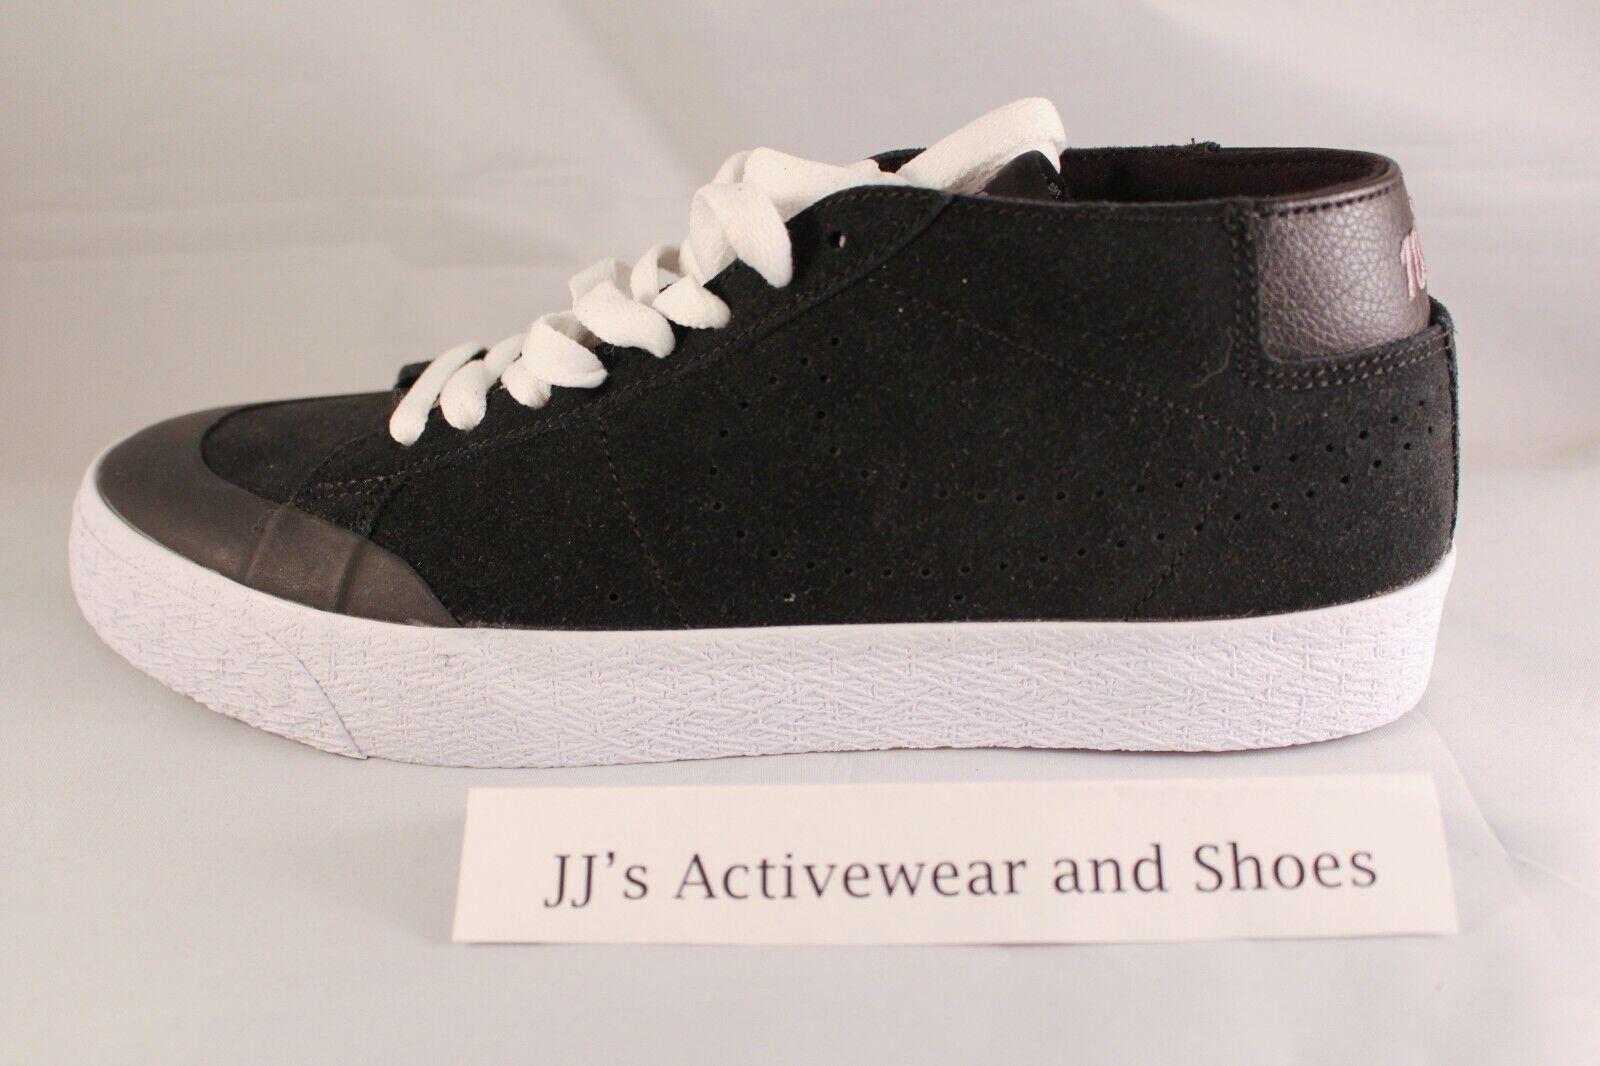 hot sale online 0b3c1 45758 Nike SB Zoom Blazer Chukka XT Black Gunsmoke Men's Shoes Multi Size 8